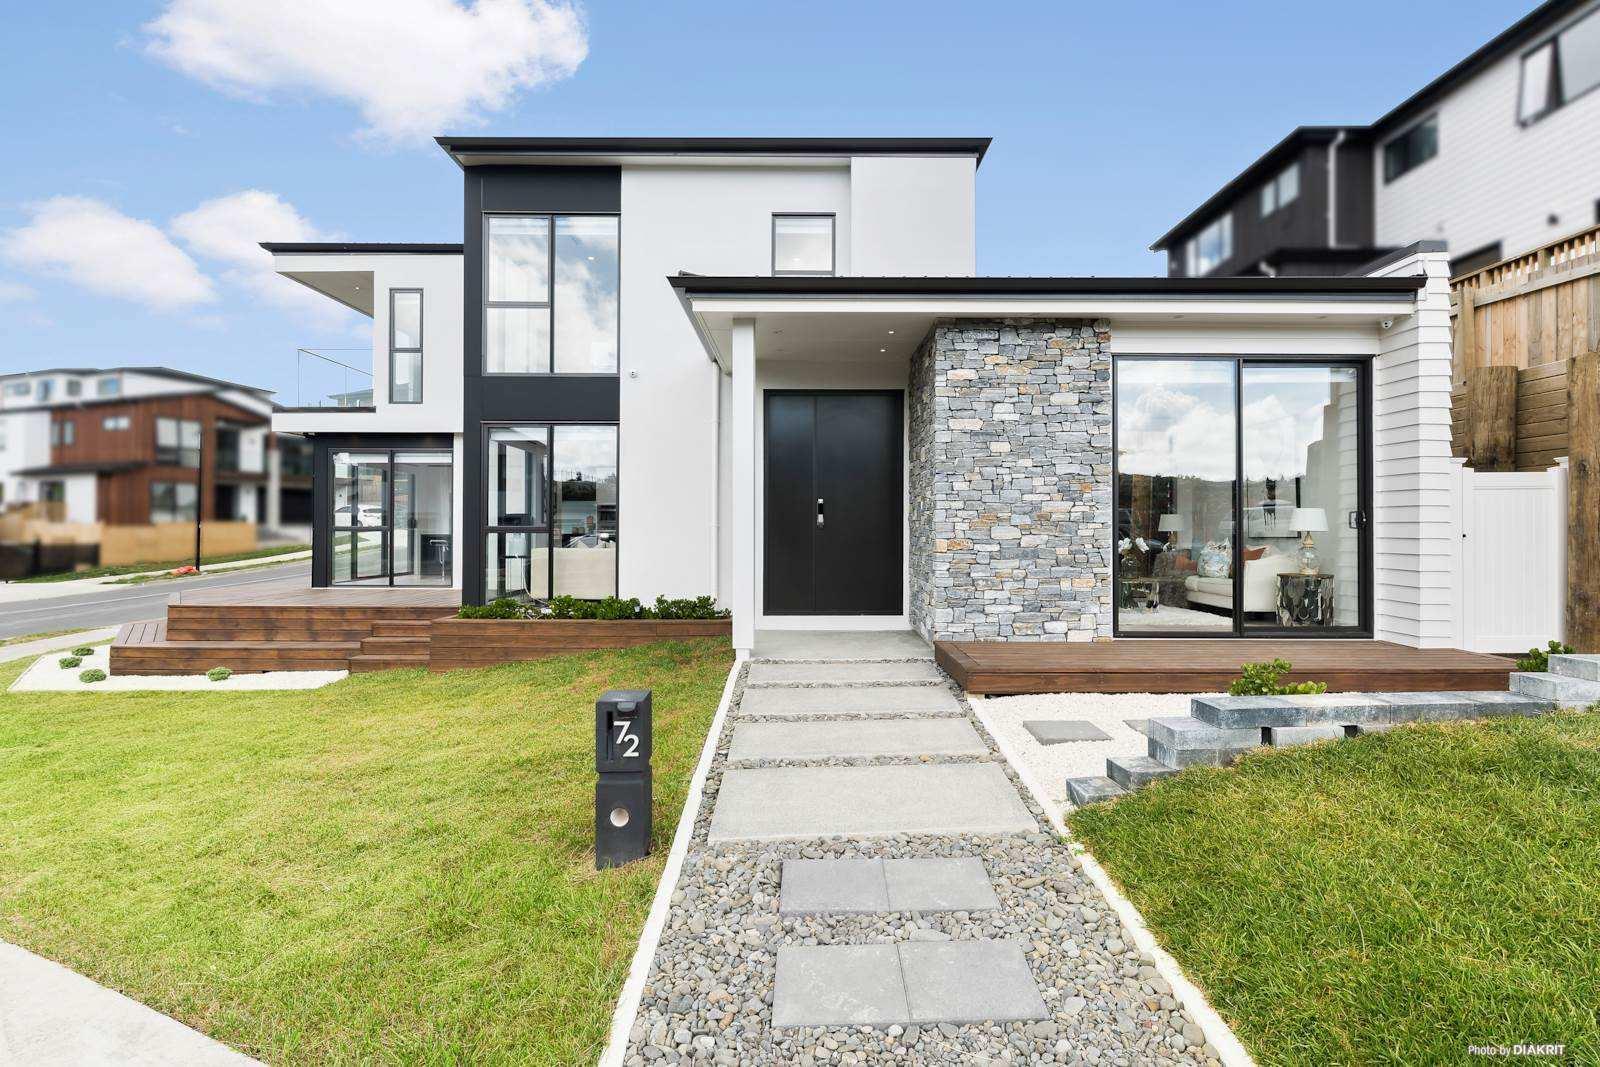 Pinehill 5房 优雅前卫靓宅 精湛设计工艺 宽敞采光格局 智能家居&舒适生活 品味惬意理想人生 A distinctive Beautiful Mansion